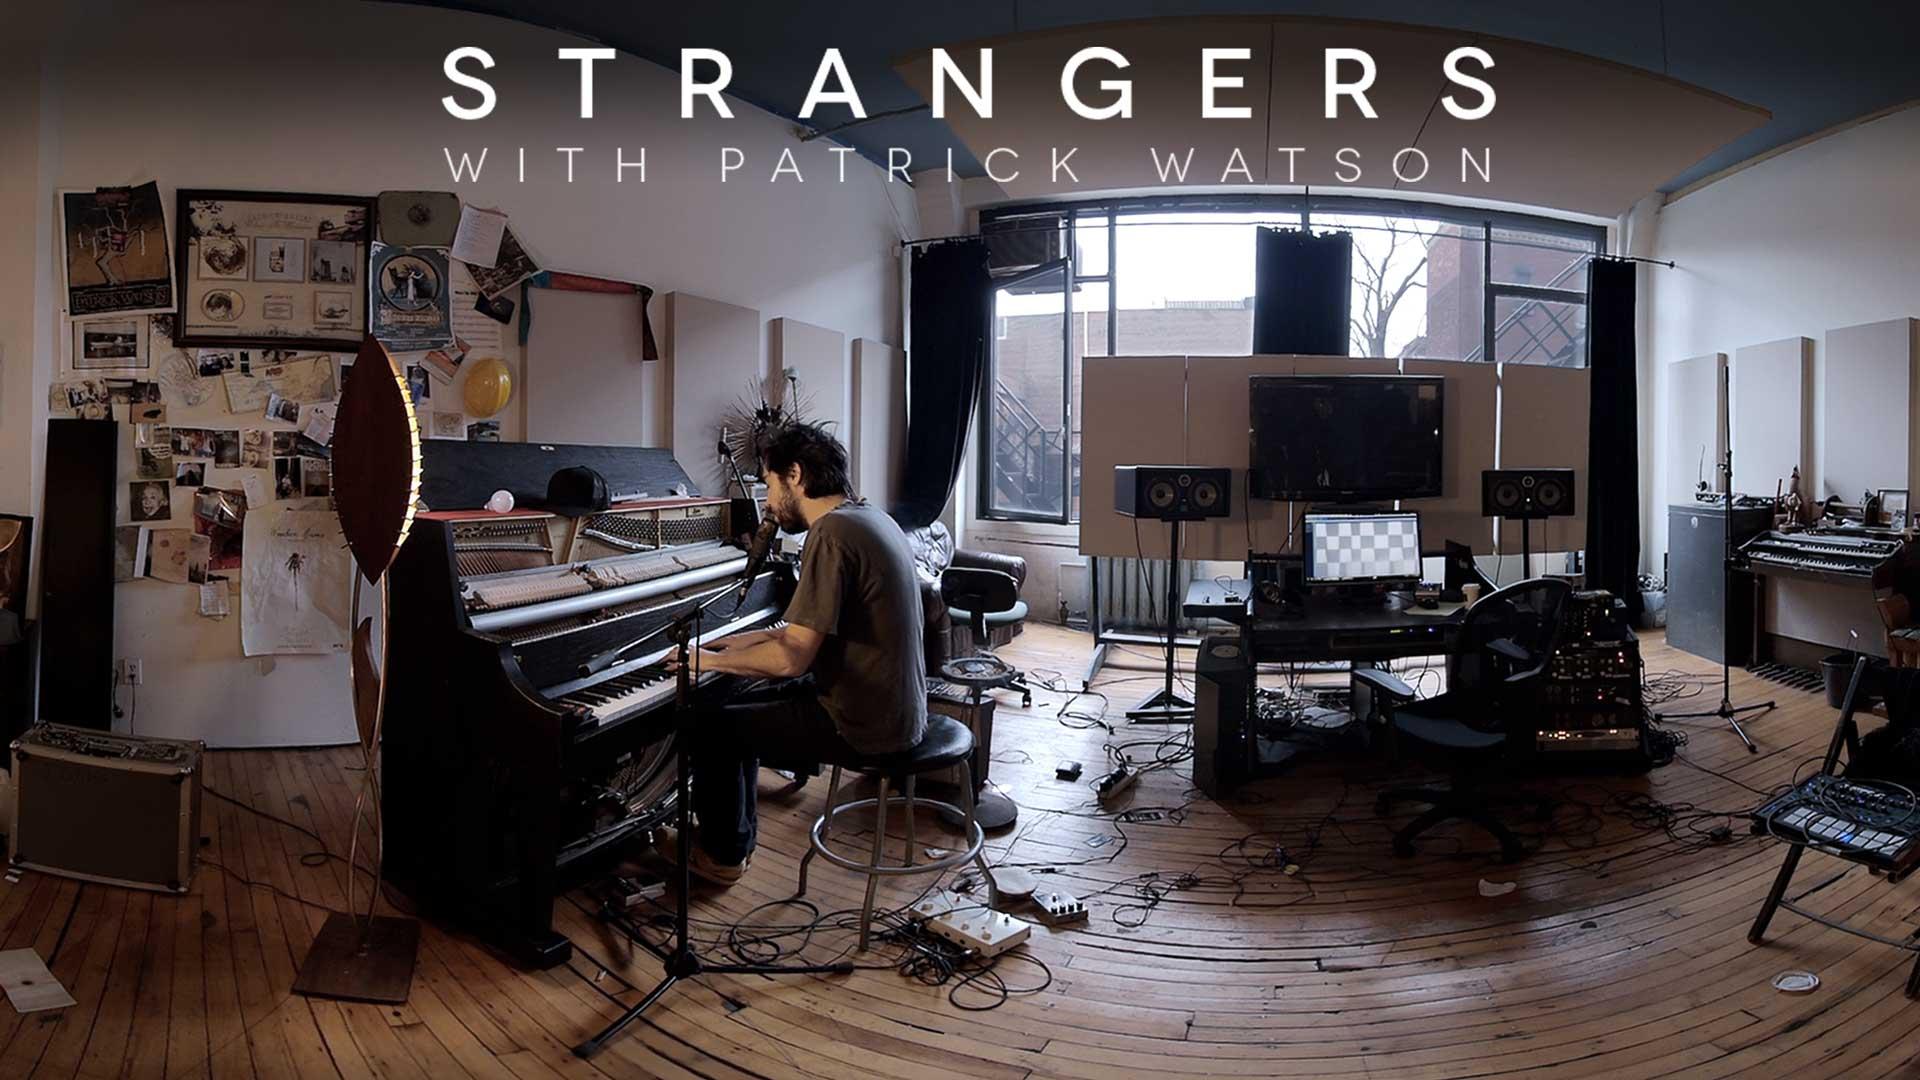 Strangers with Patrick Watson